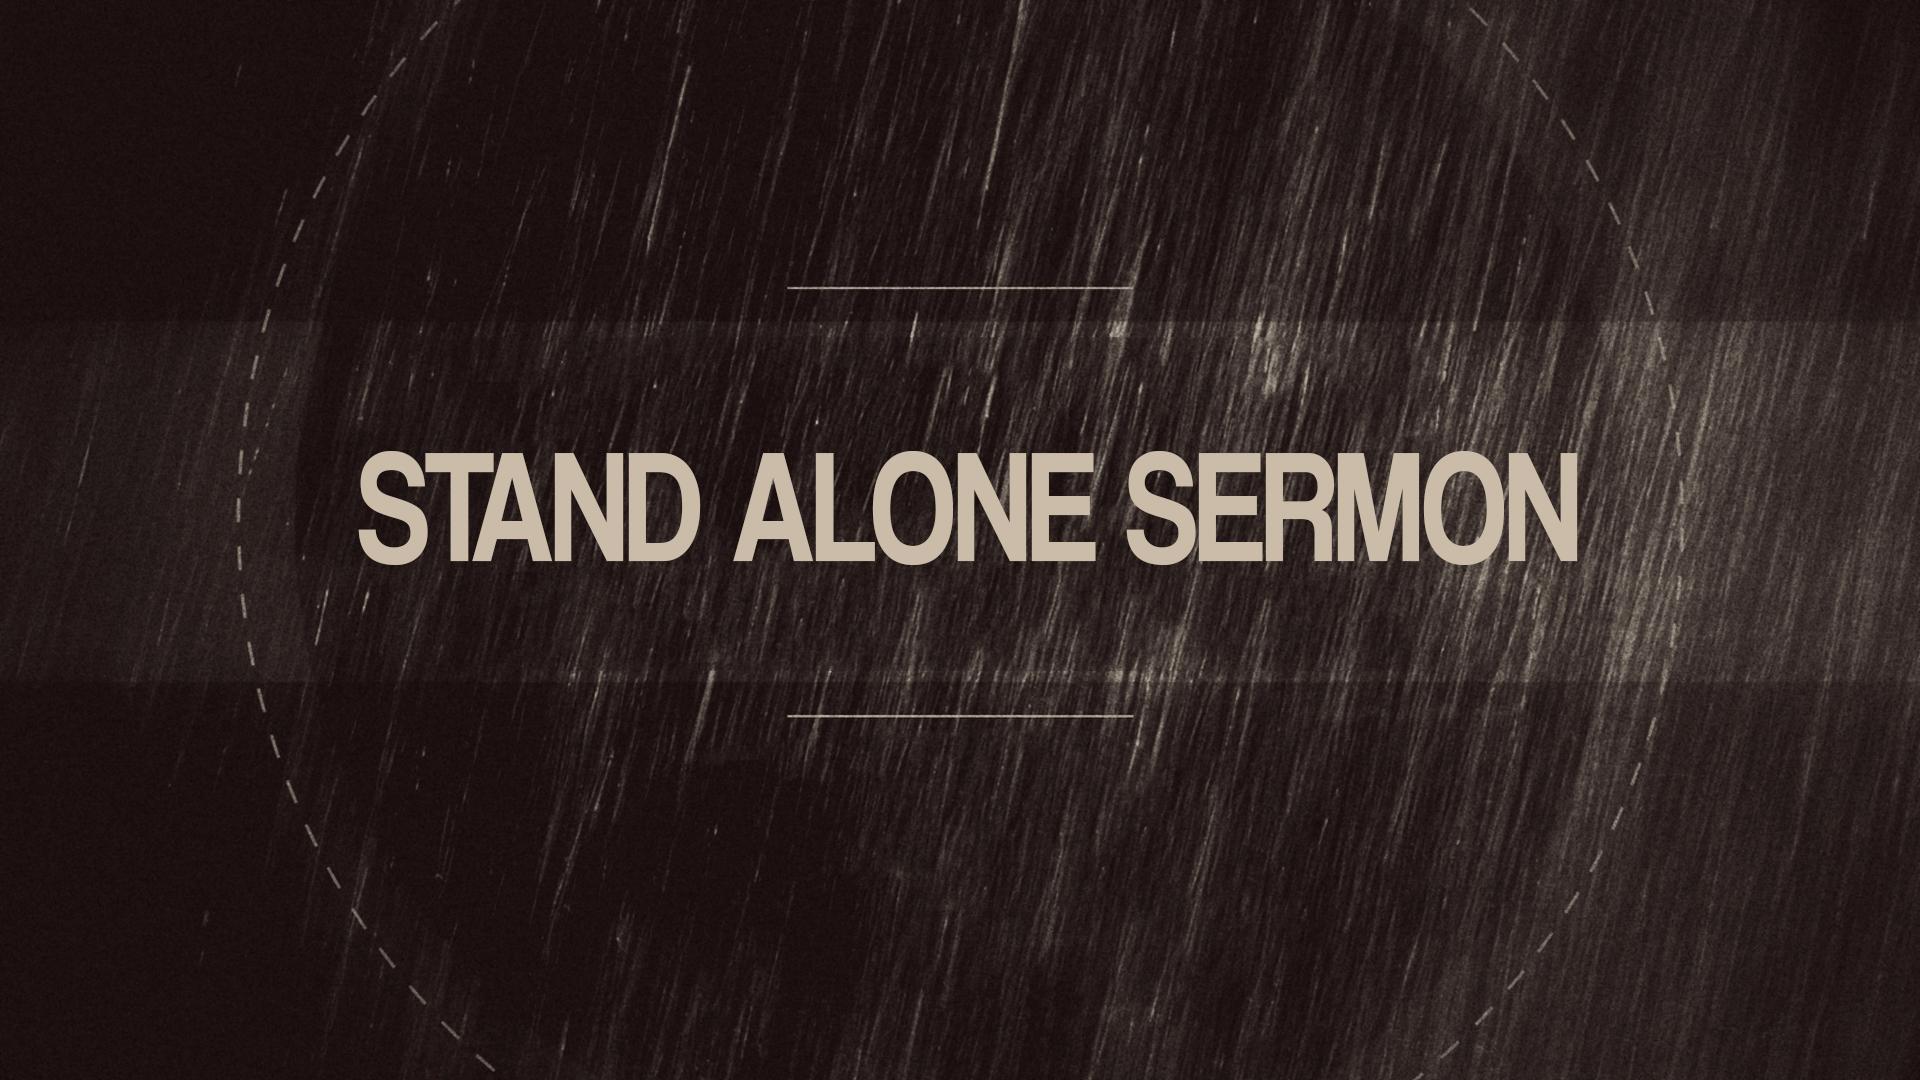 Stand alone sermon rotator.jpg